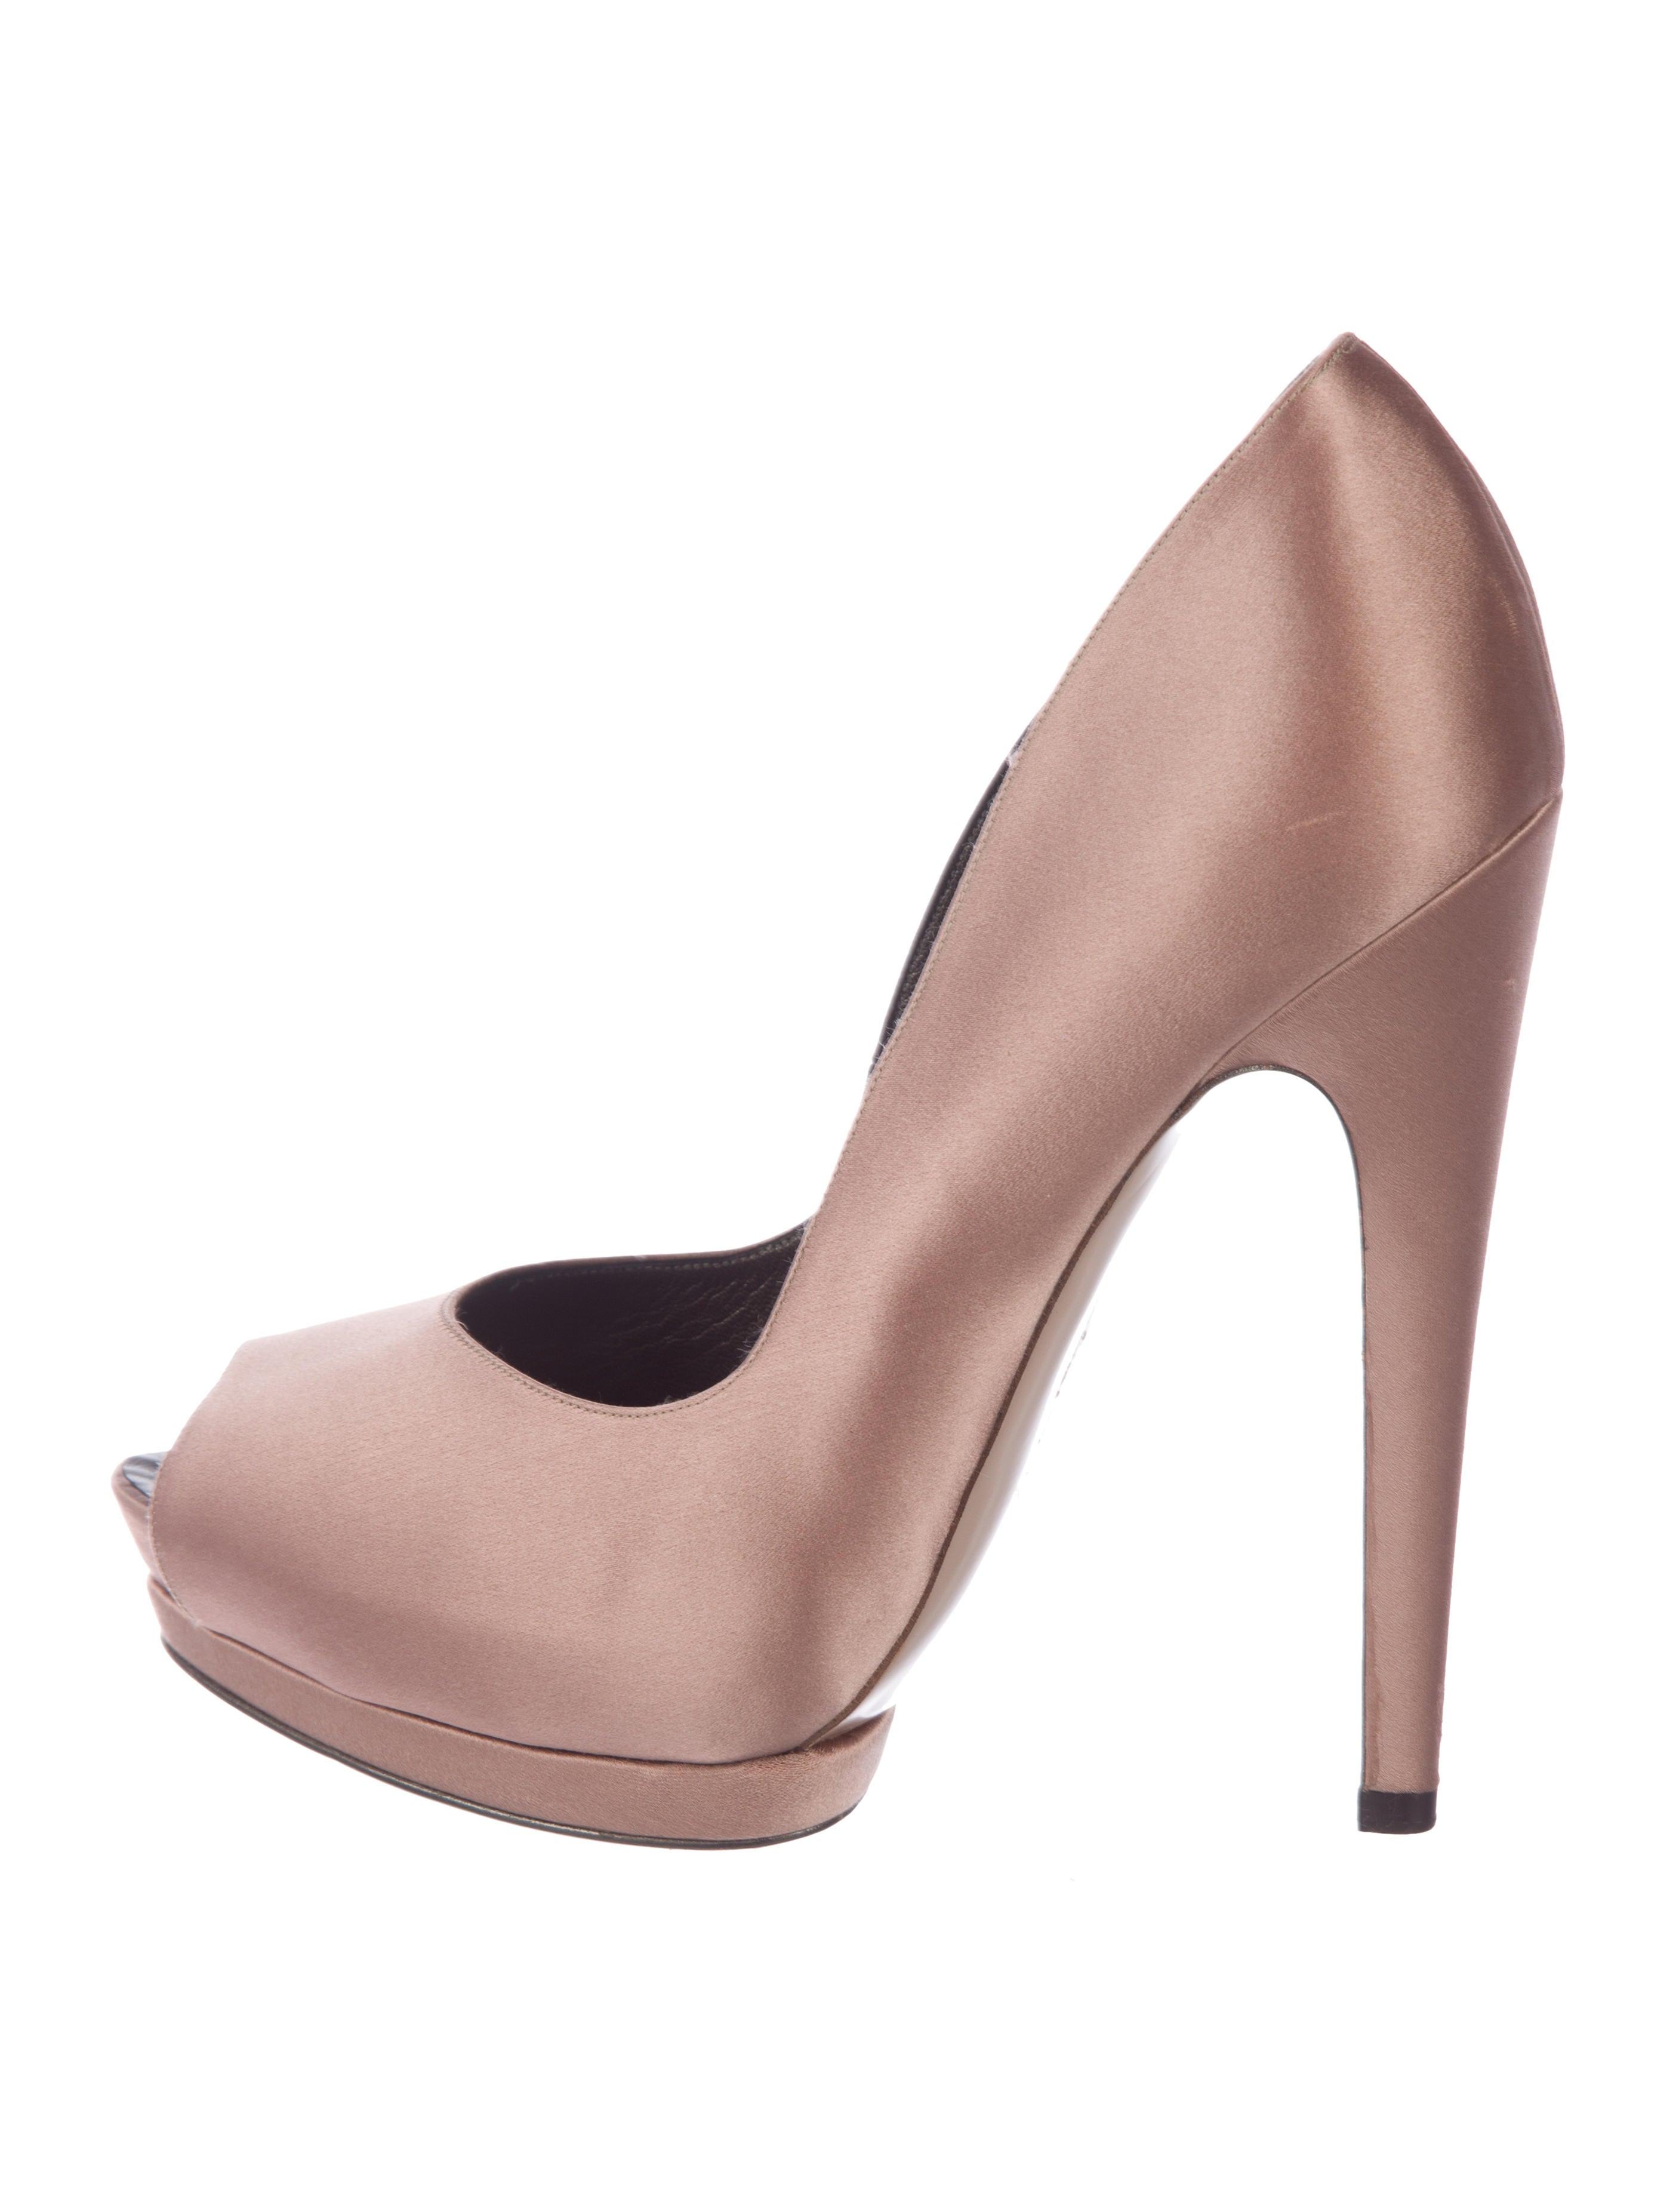 b936753b738 Salvatore Ferragamo Satin Peep-Toe Pumps - Shoes - SAL93931